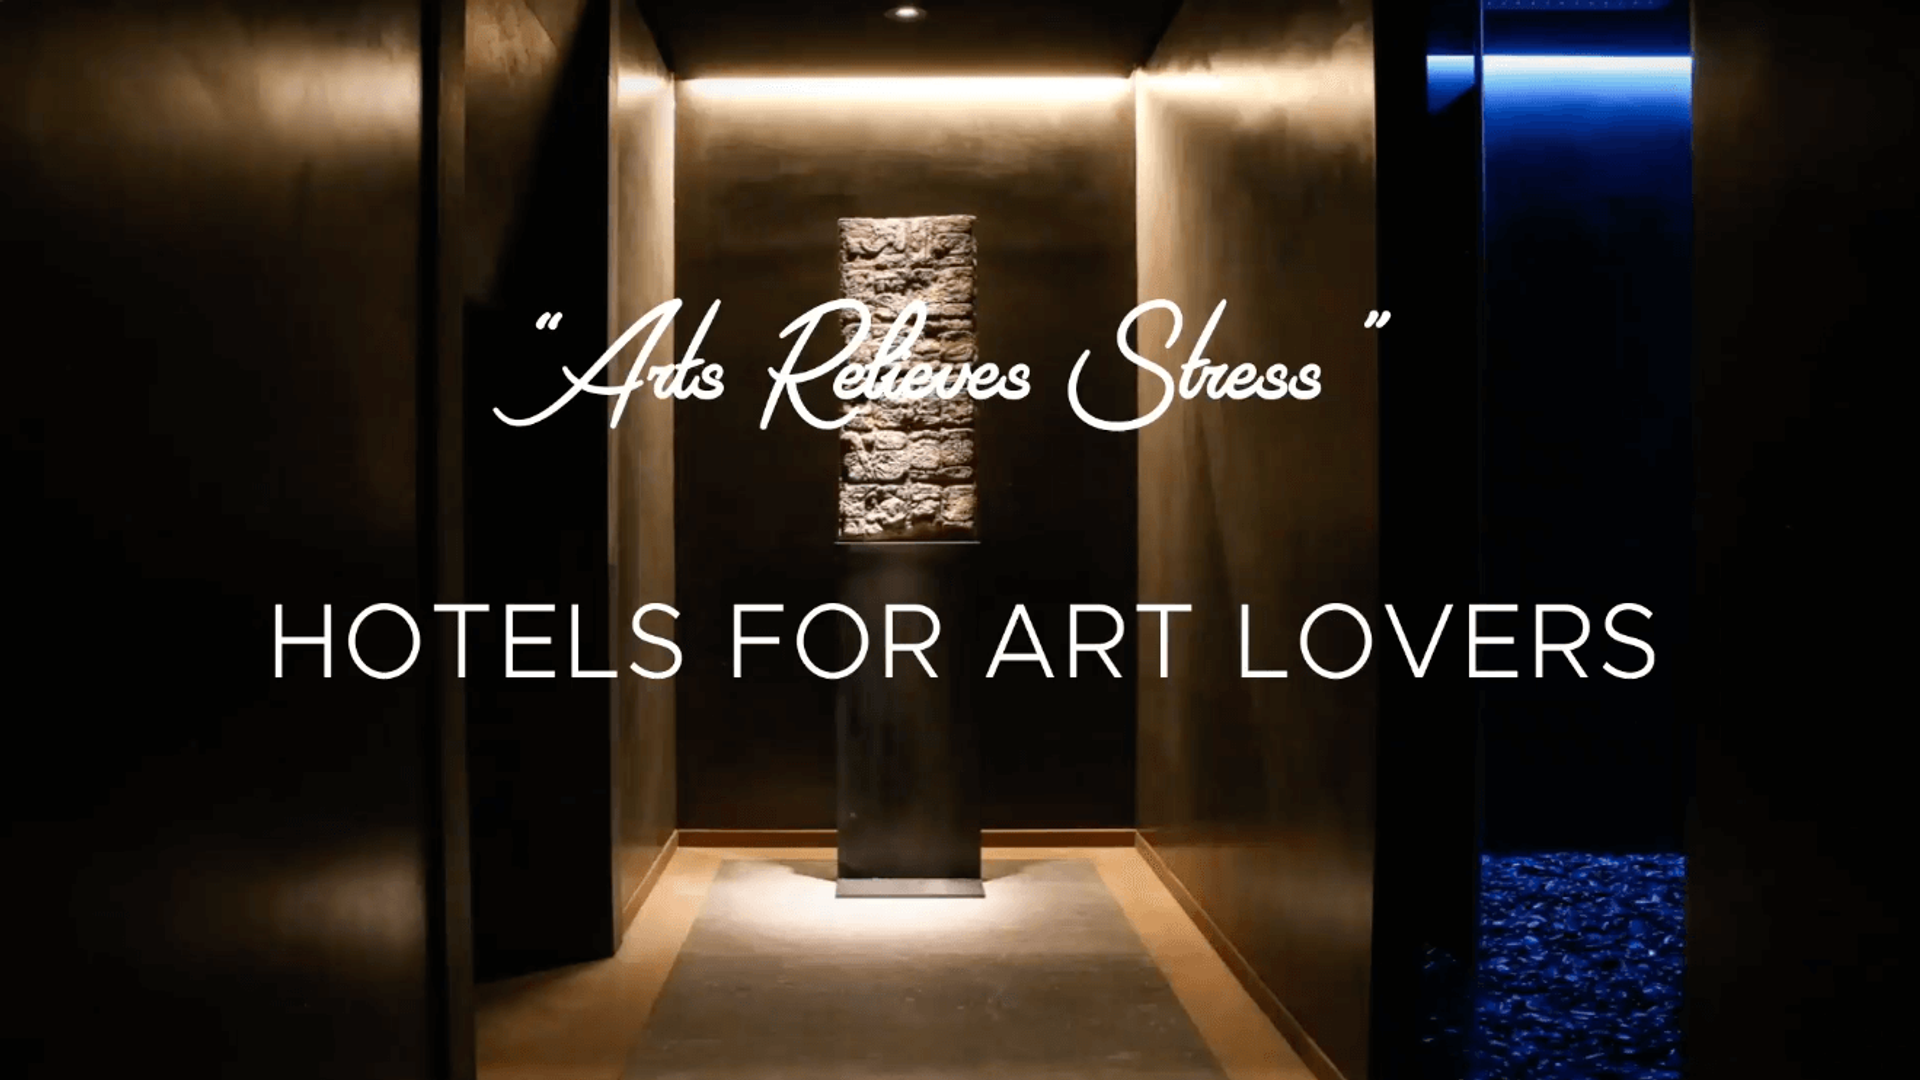 HOTEL & ARTE